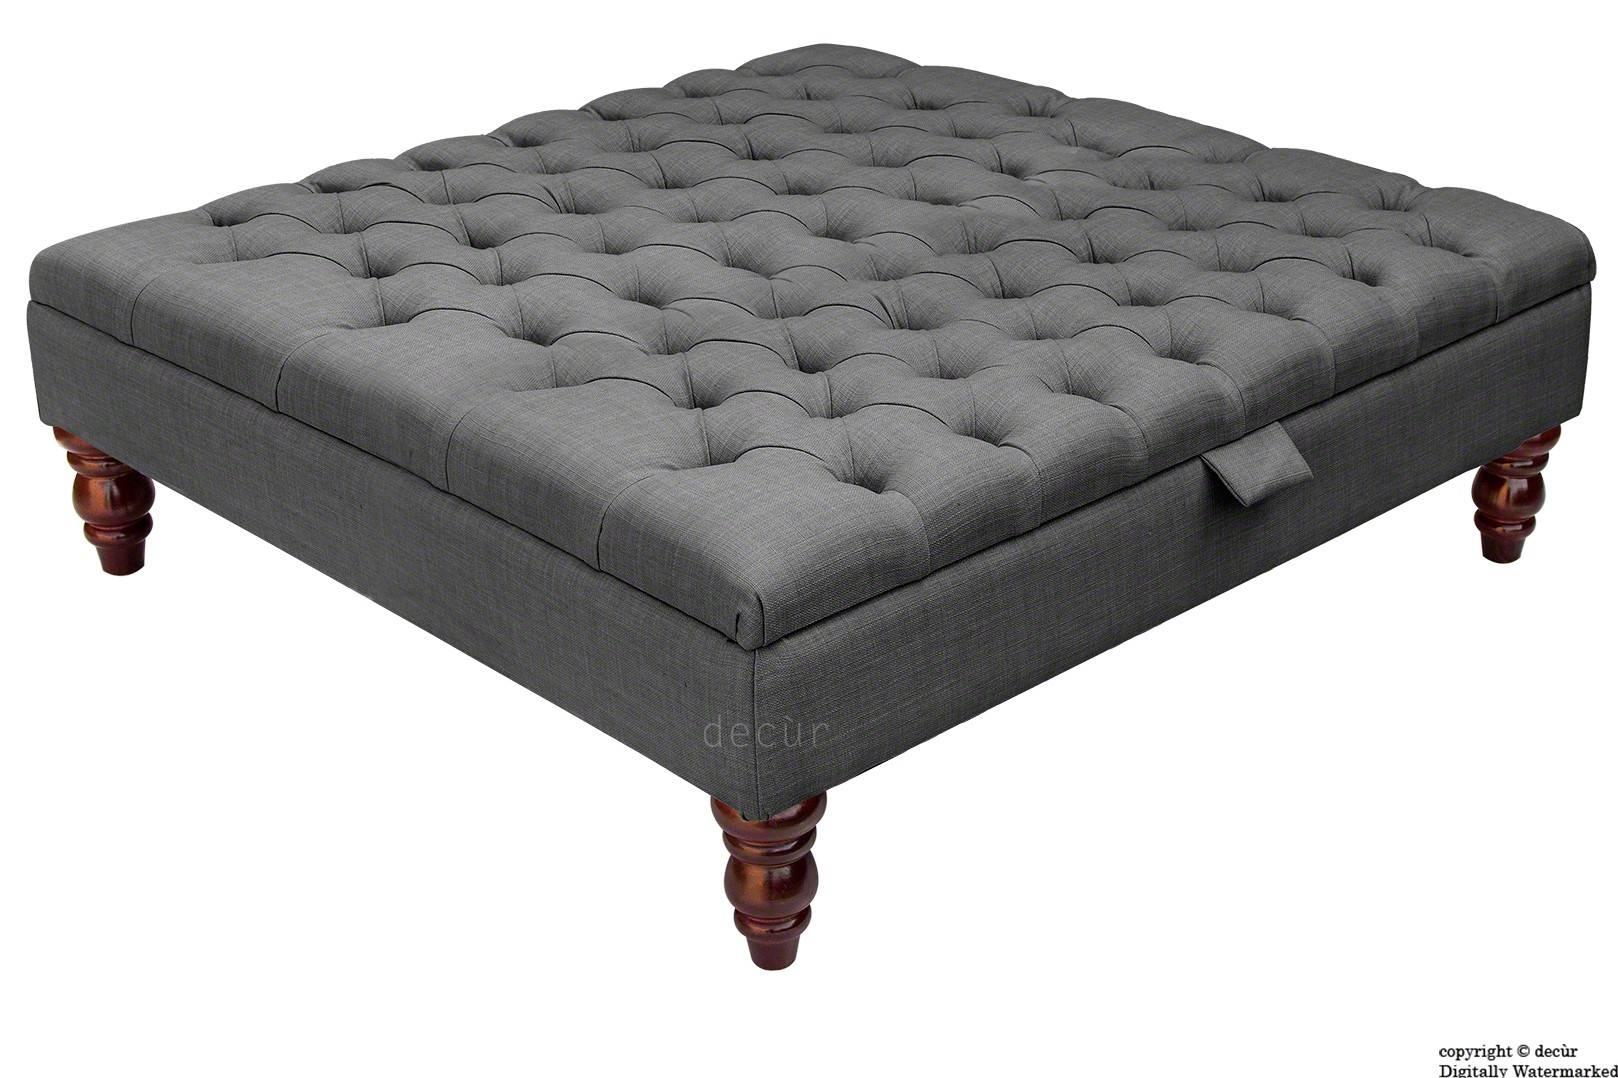 Bespoke Designer Sofas, Footstools, Bespoke Footstools, Bespoke with Large Footstools (Image 10 of 30)